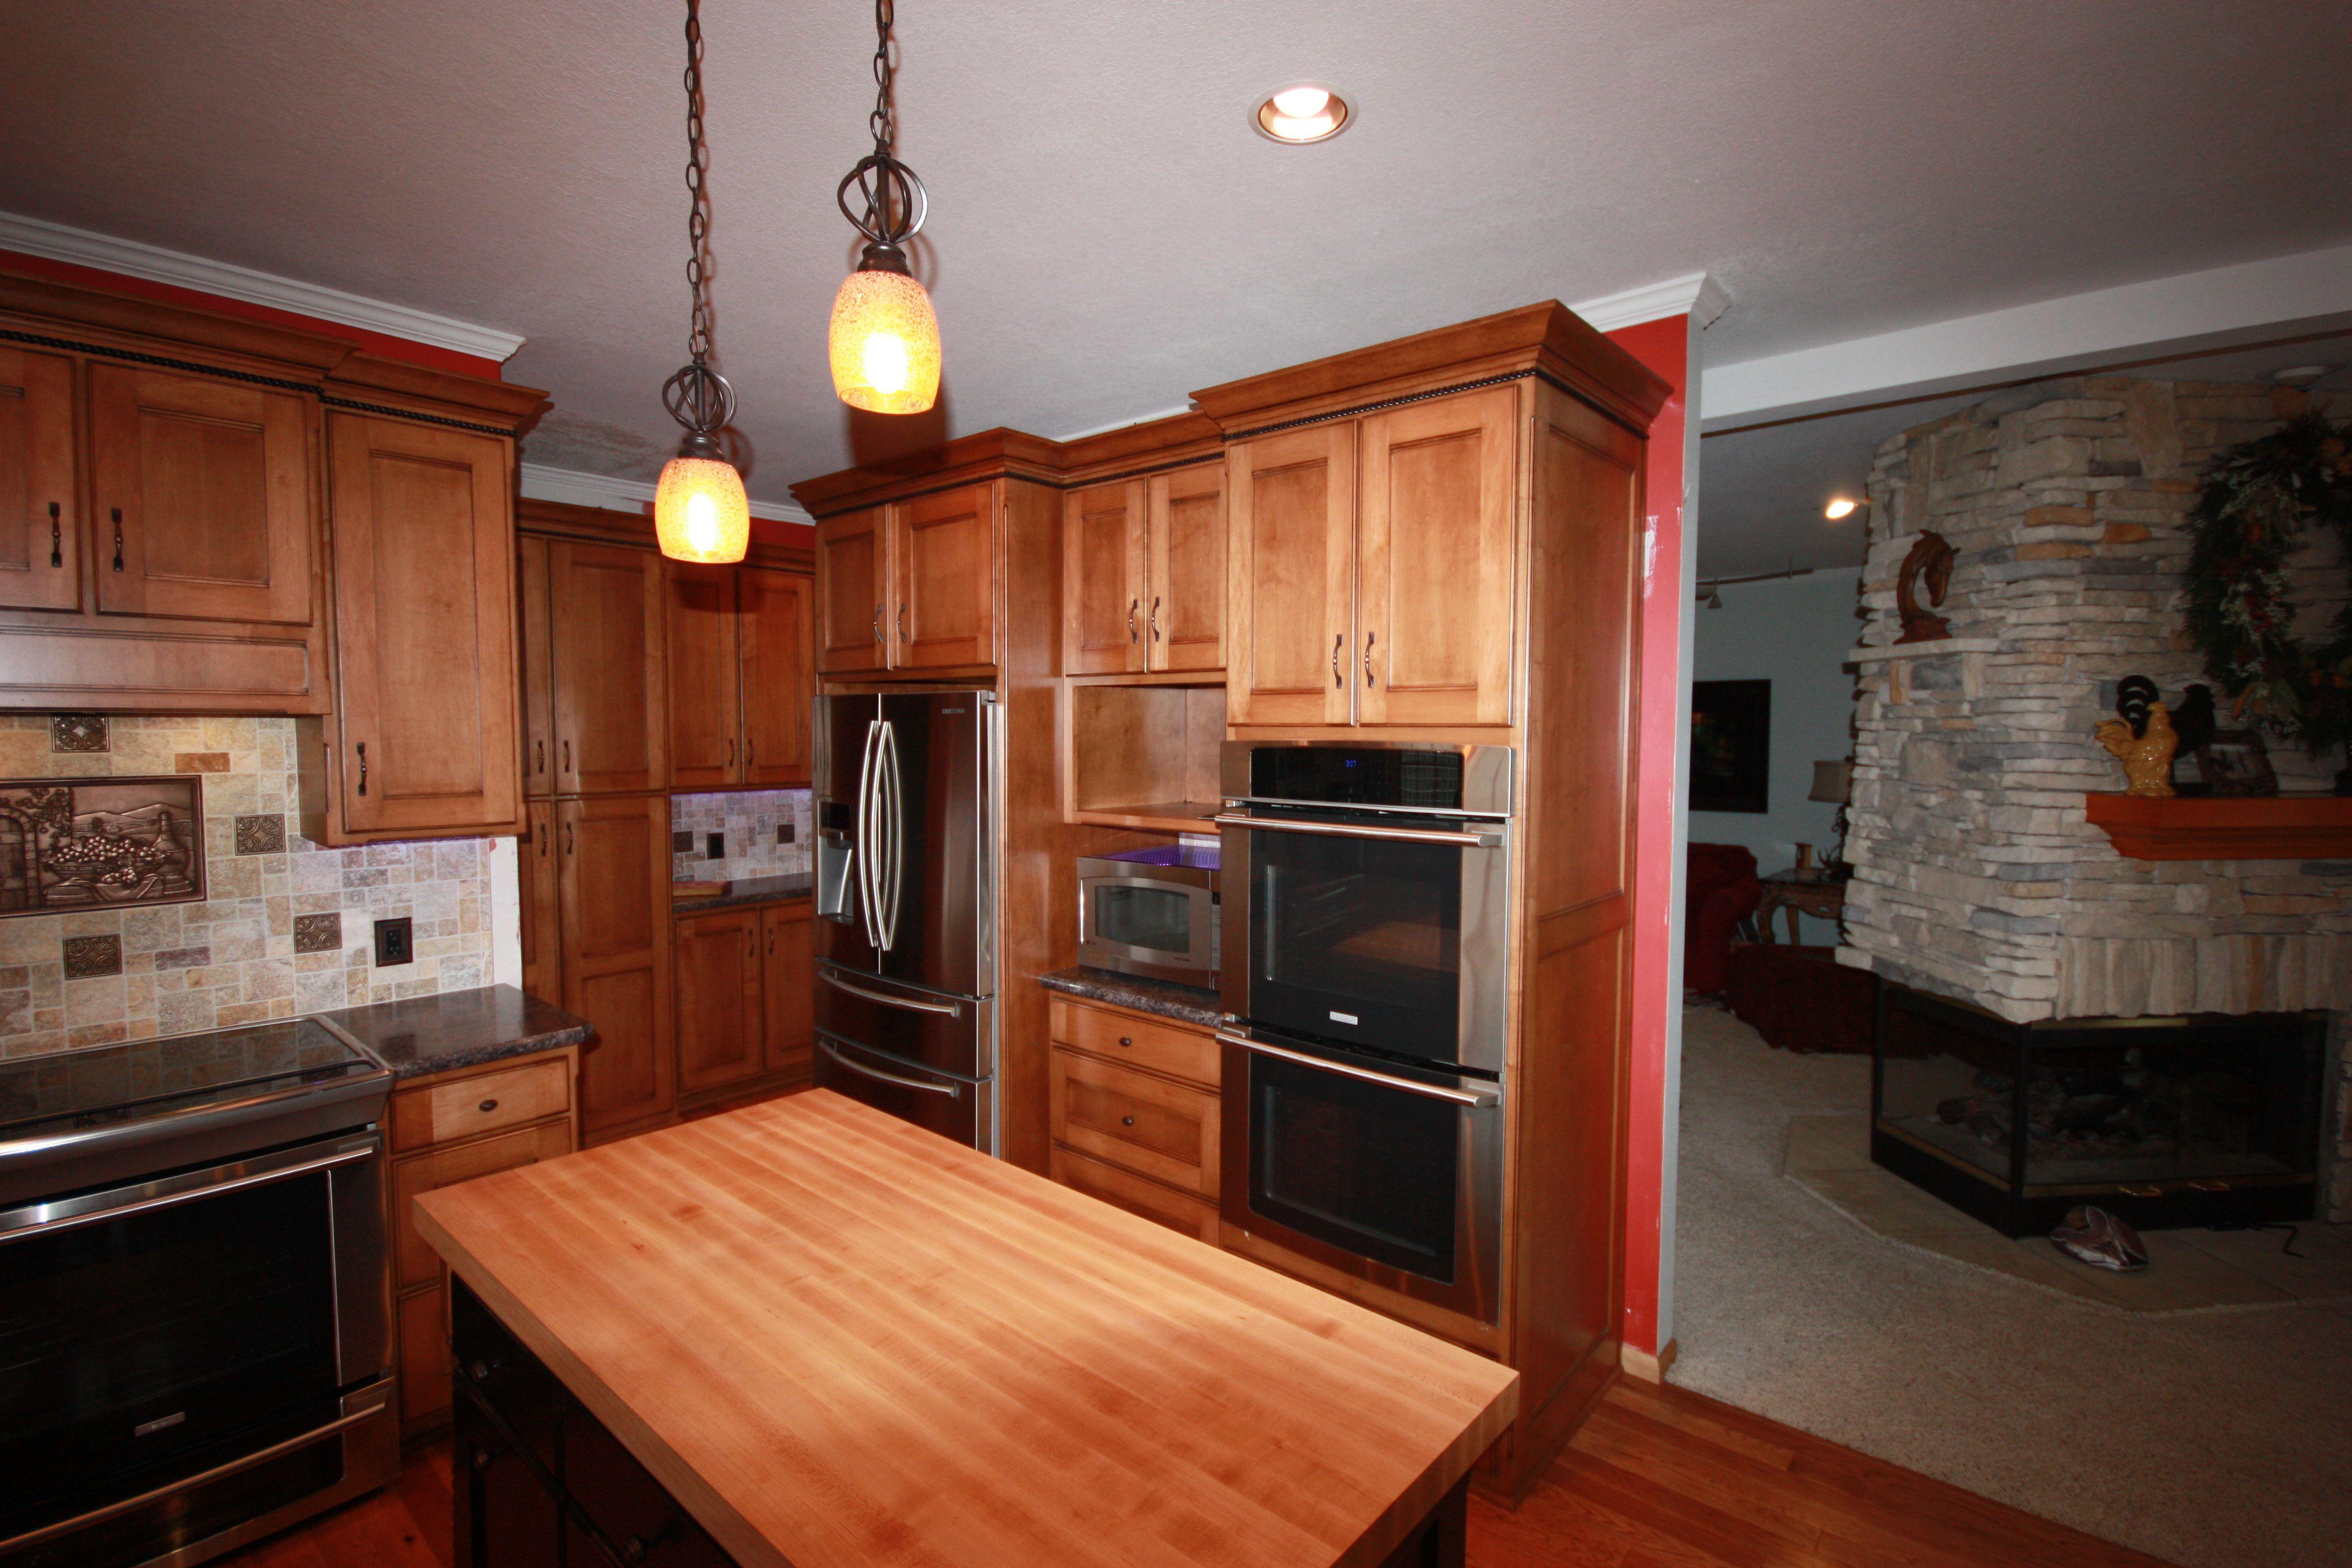 Maple Kitchen - Perimeter Cabinets have Dark Mahogany ...